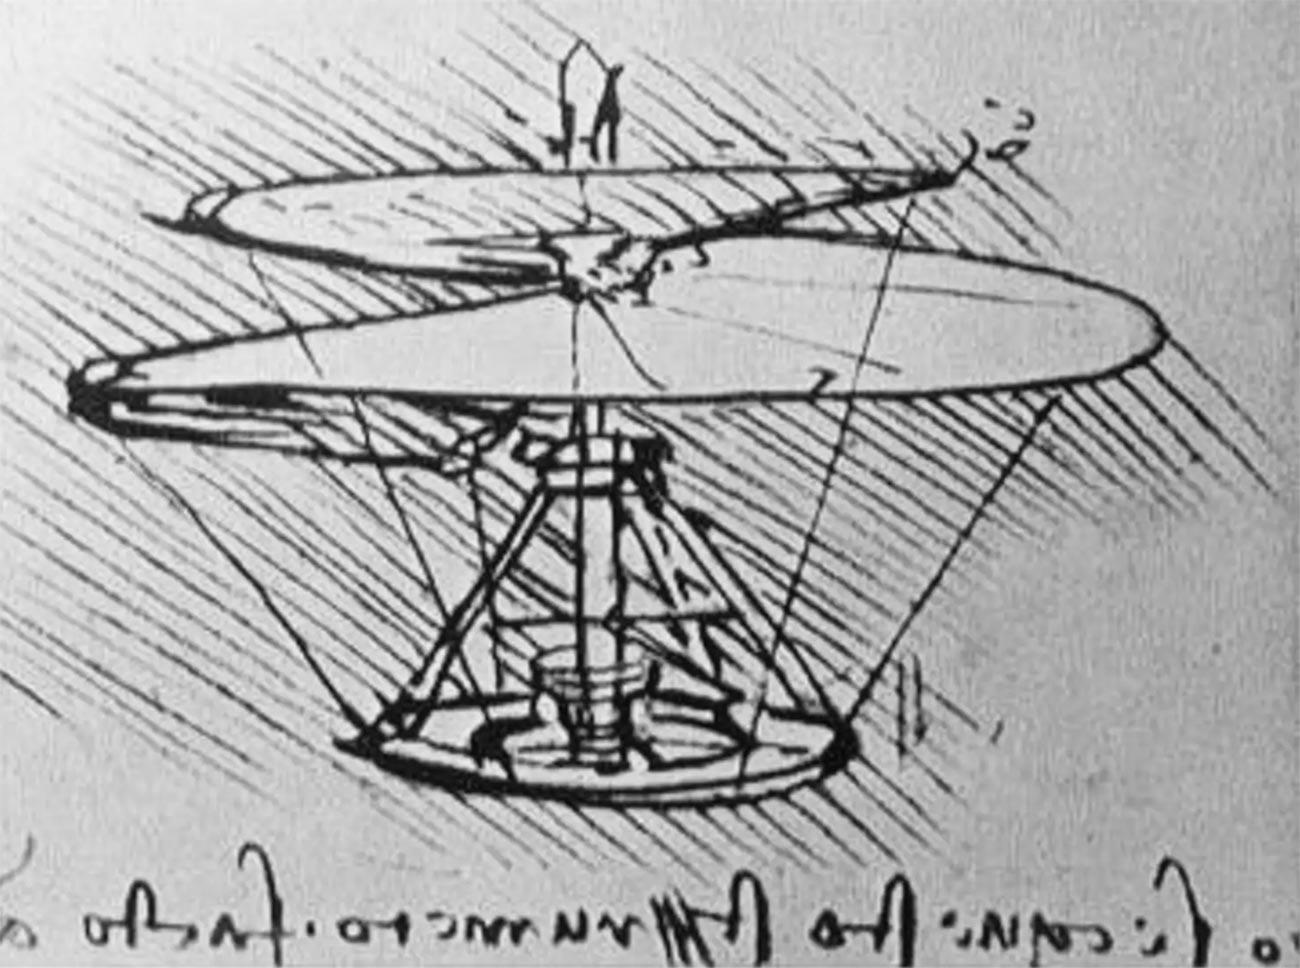 Projet de Léonard de Vinci